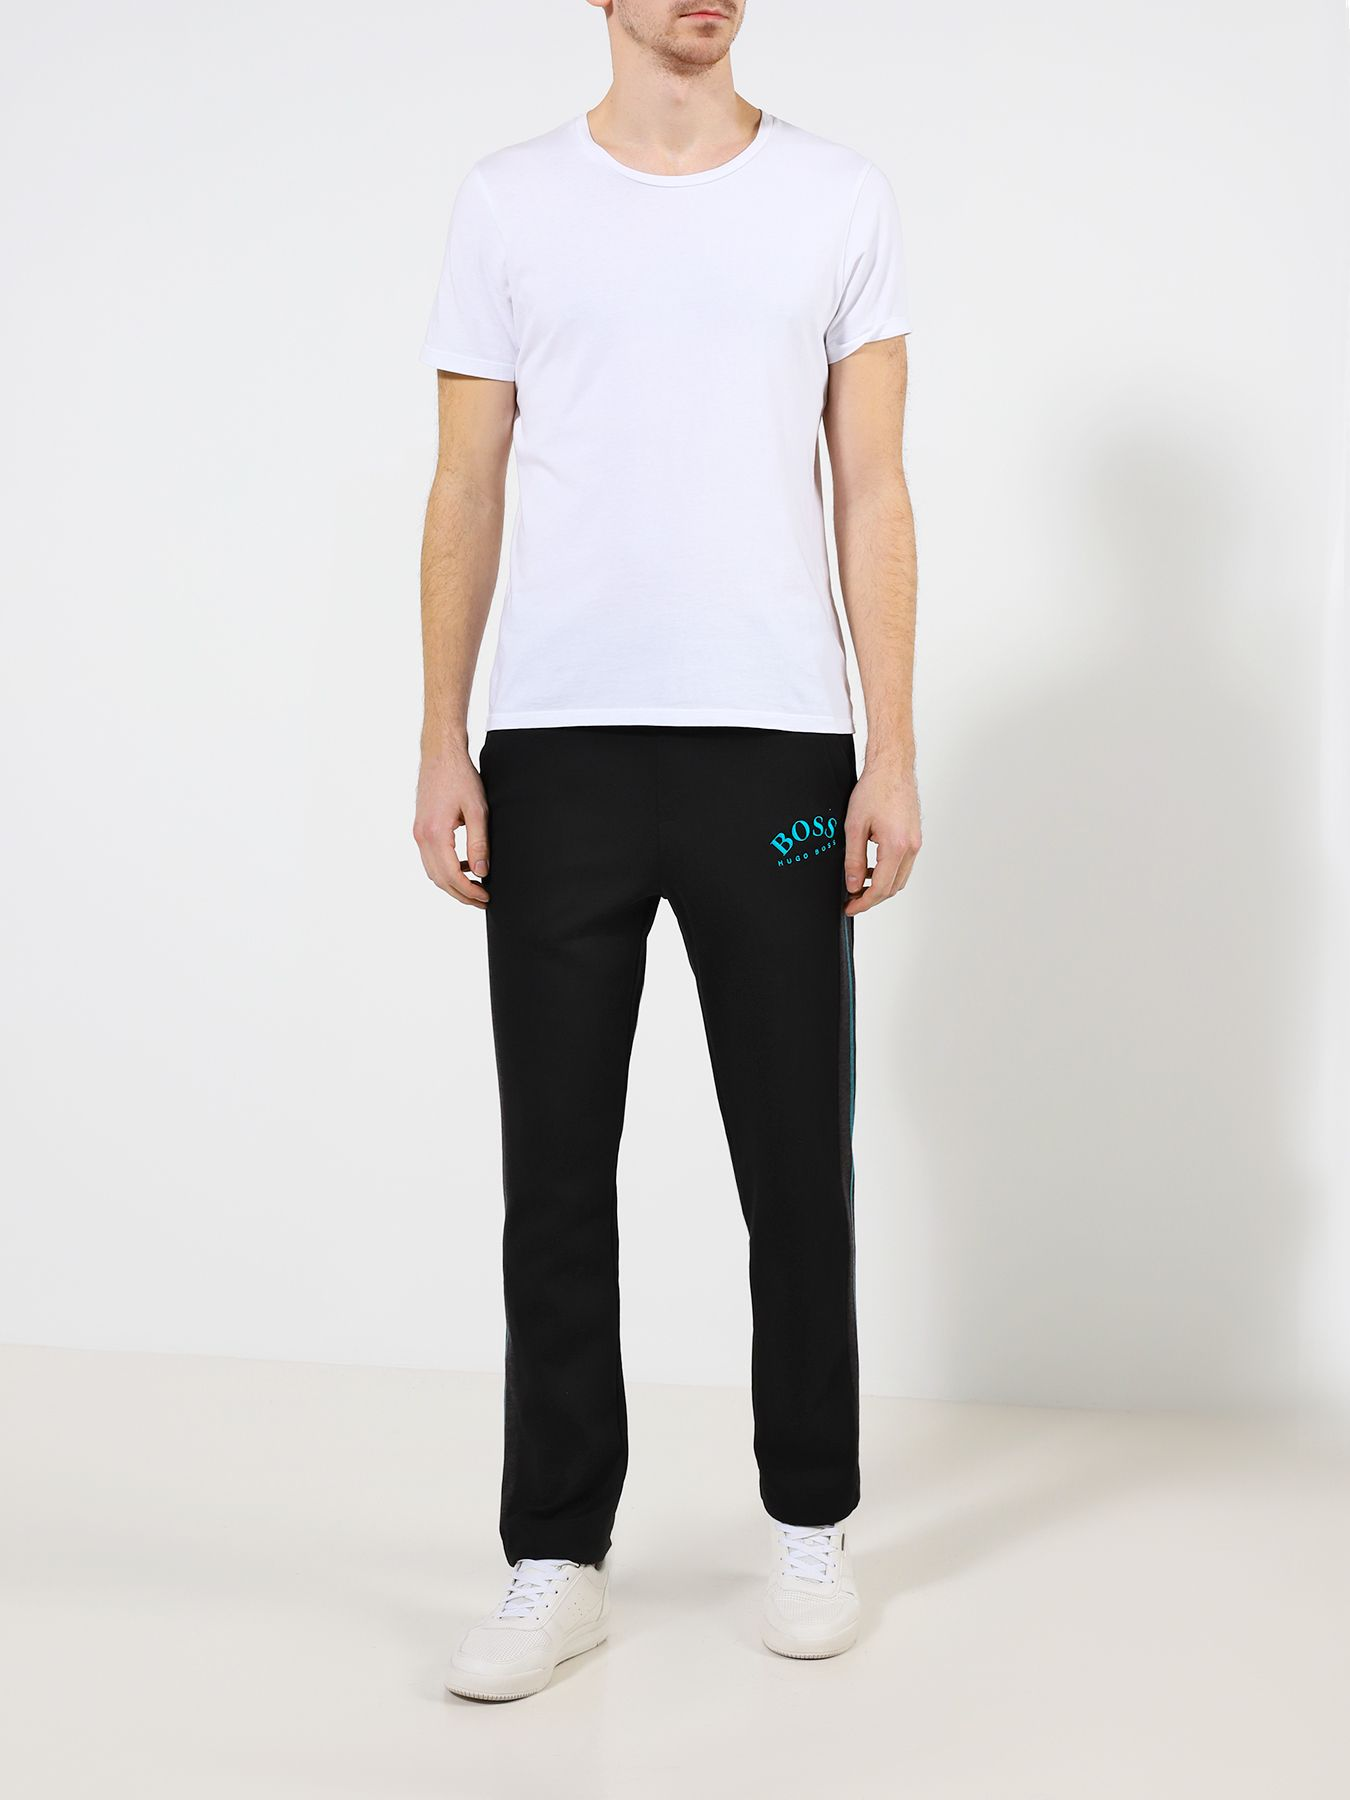 Брюки BOSS Спортивные брюки Hadim брюки спортивные columbia columbia anytime outdoor boot cut pant